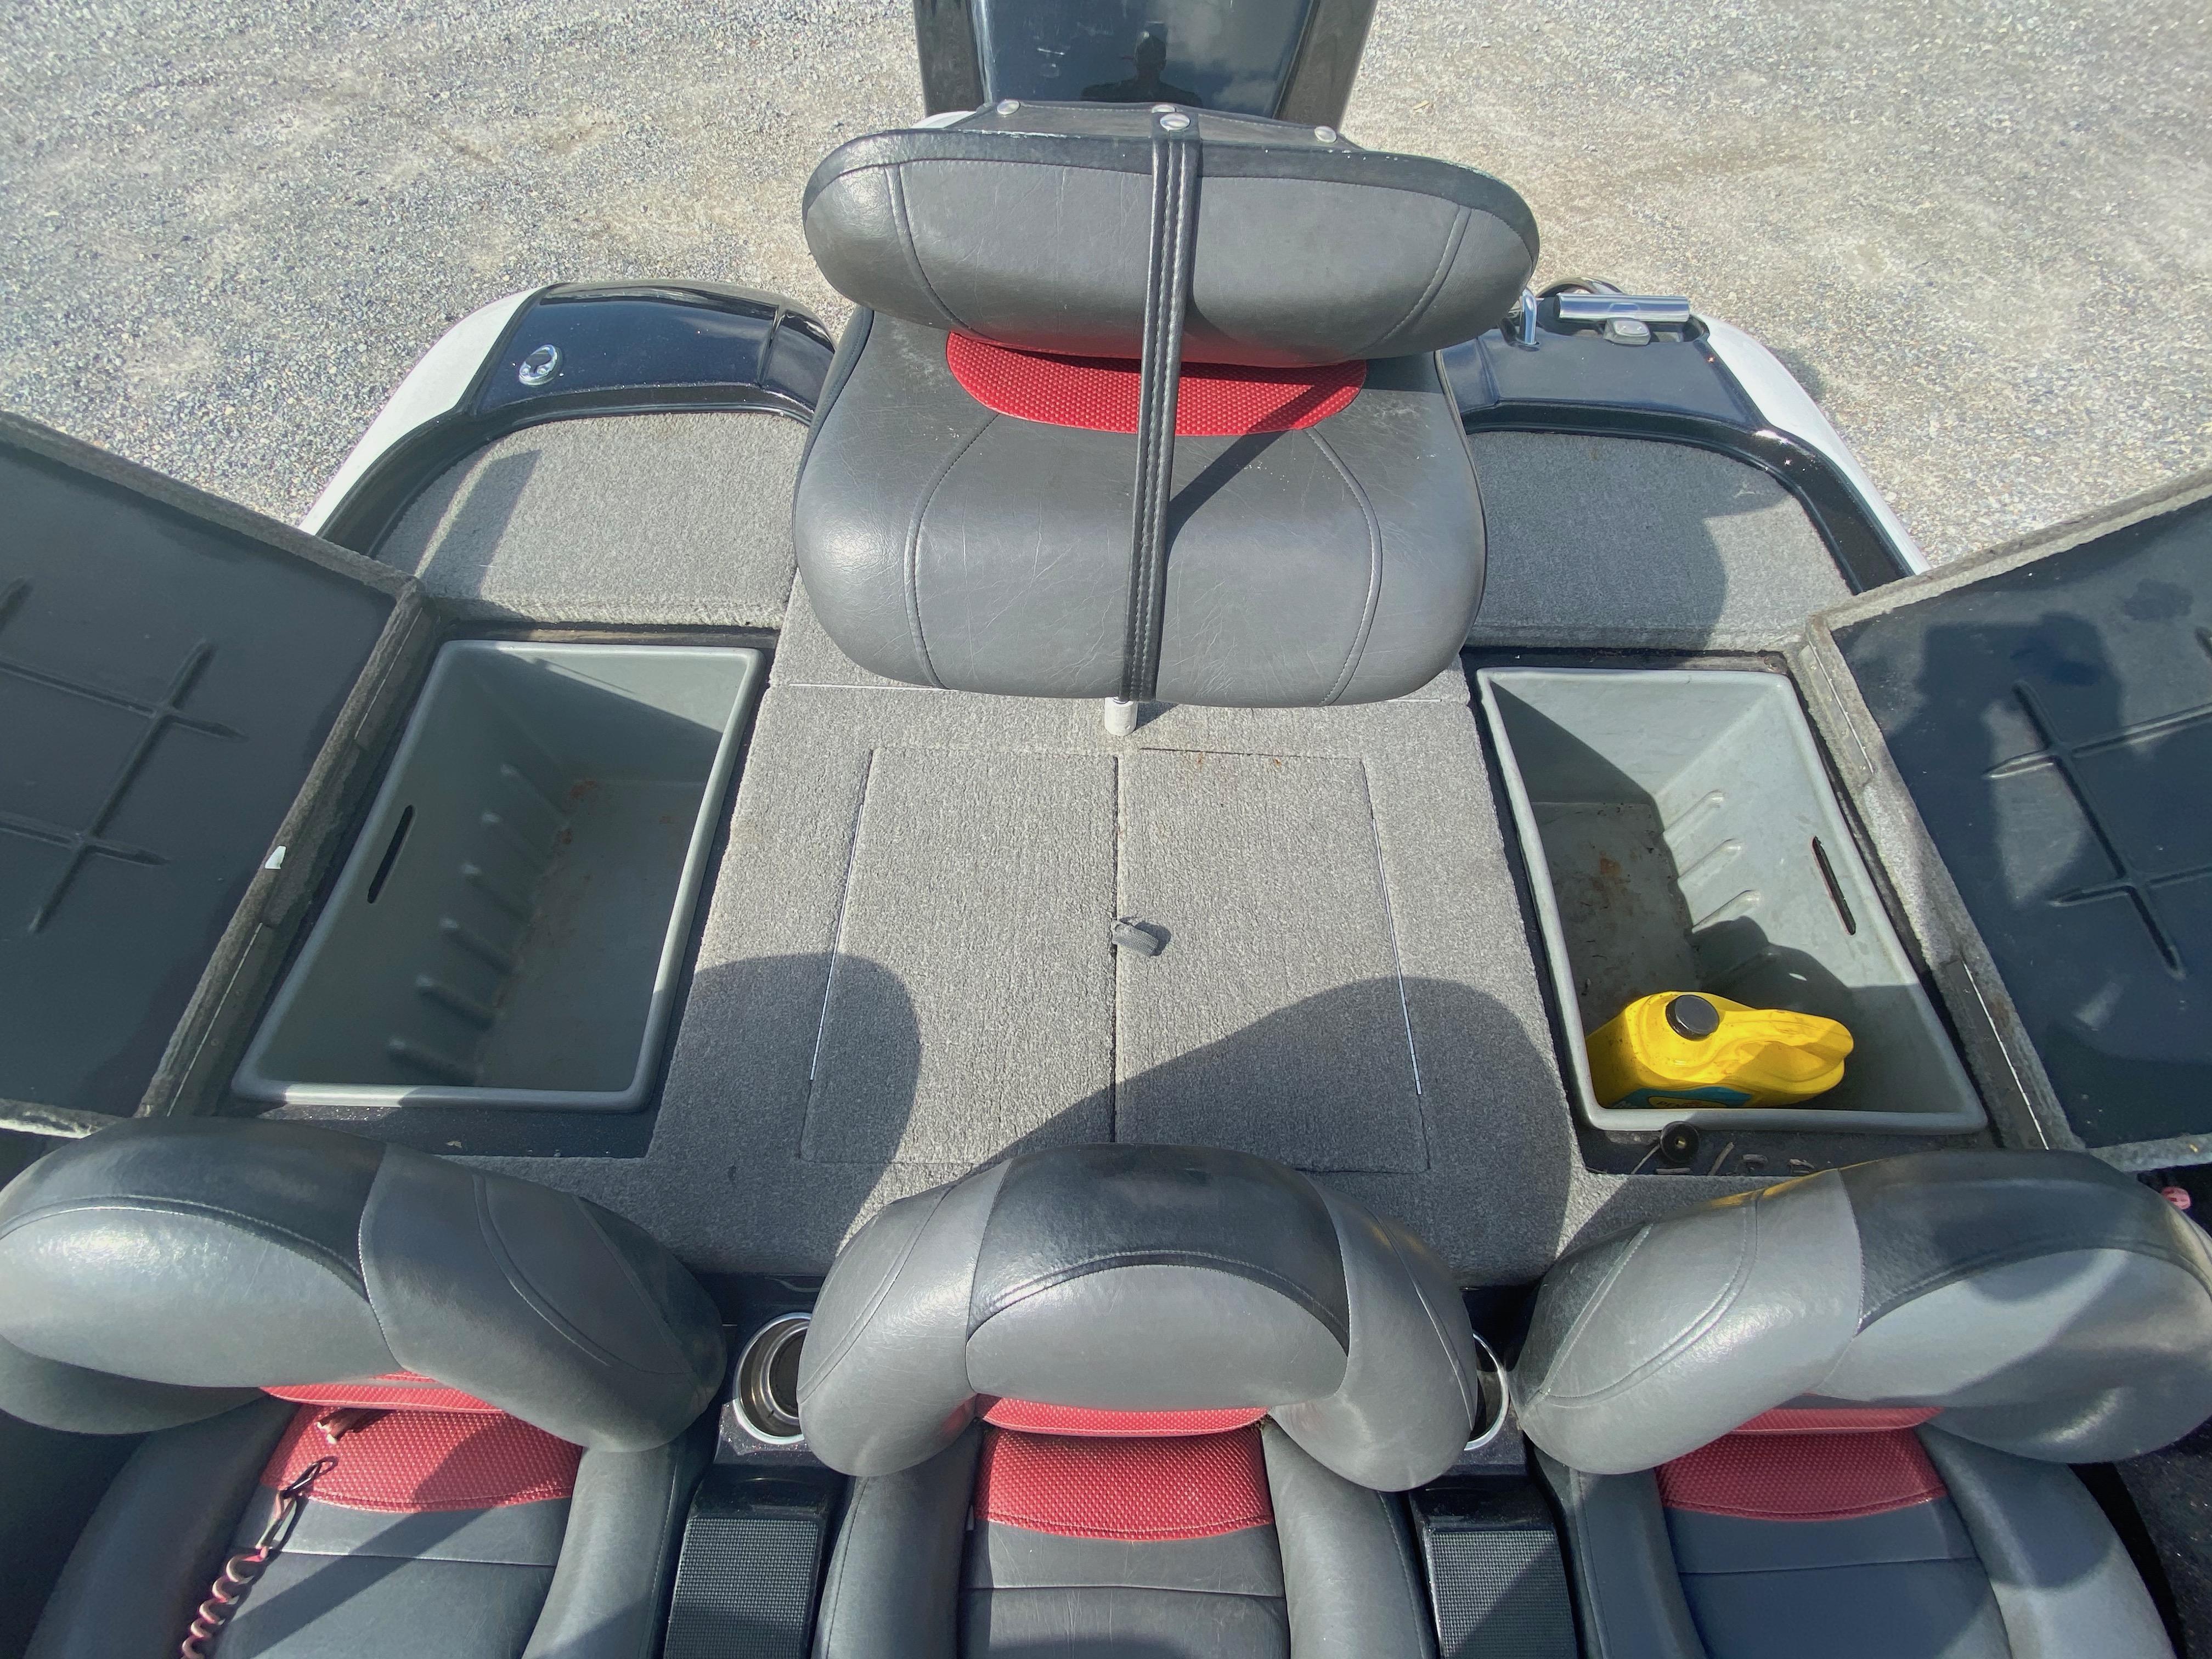 2011 Nitro boat for sale, model of the boat is Z6 & Image # 7 of 18